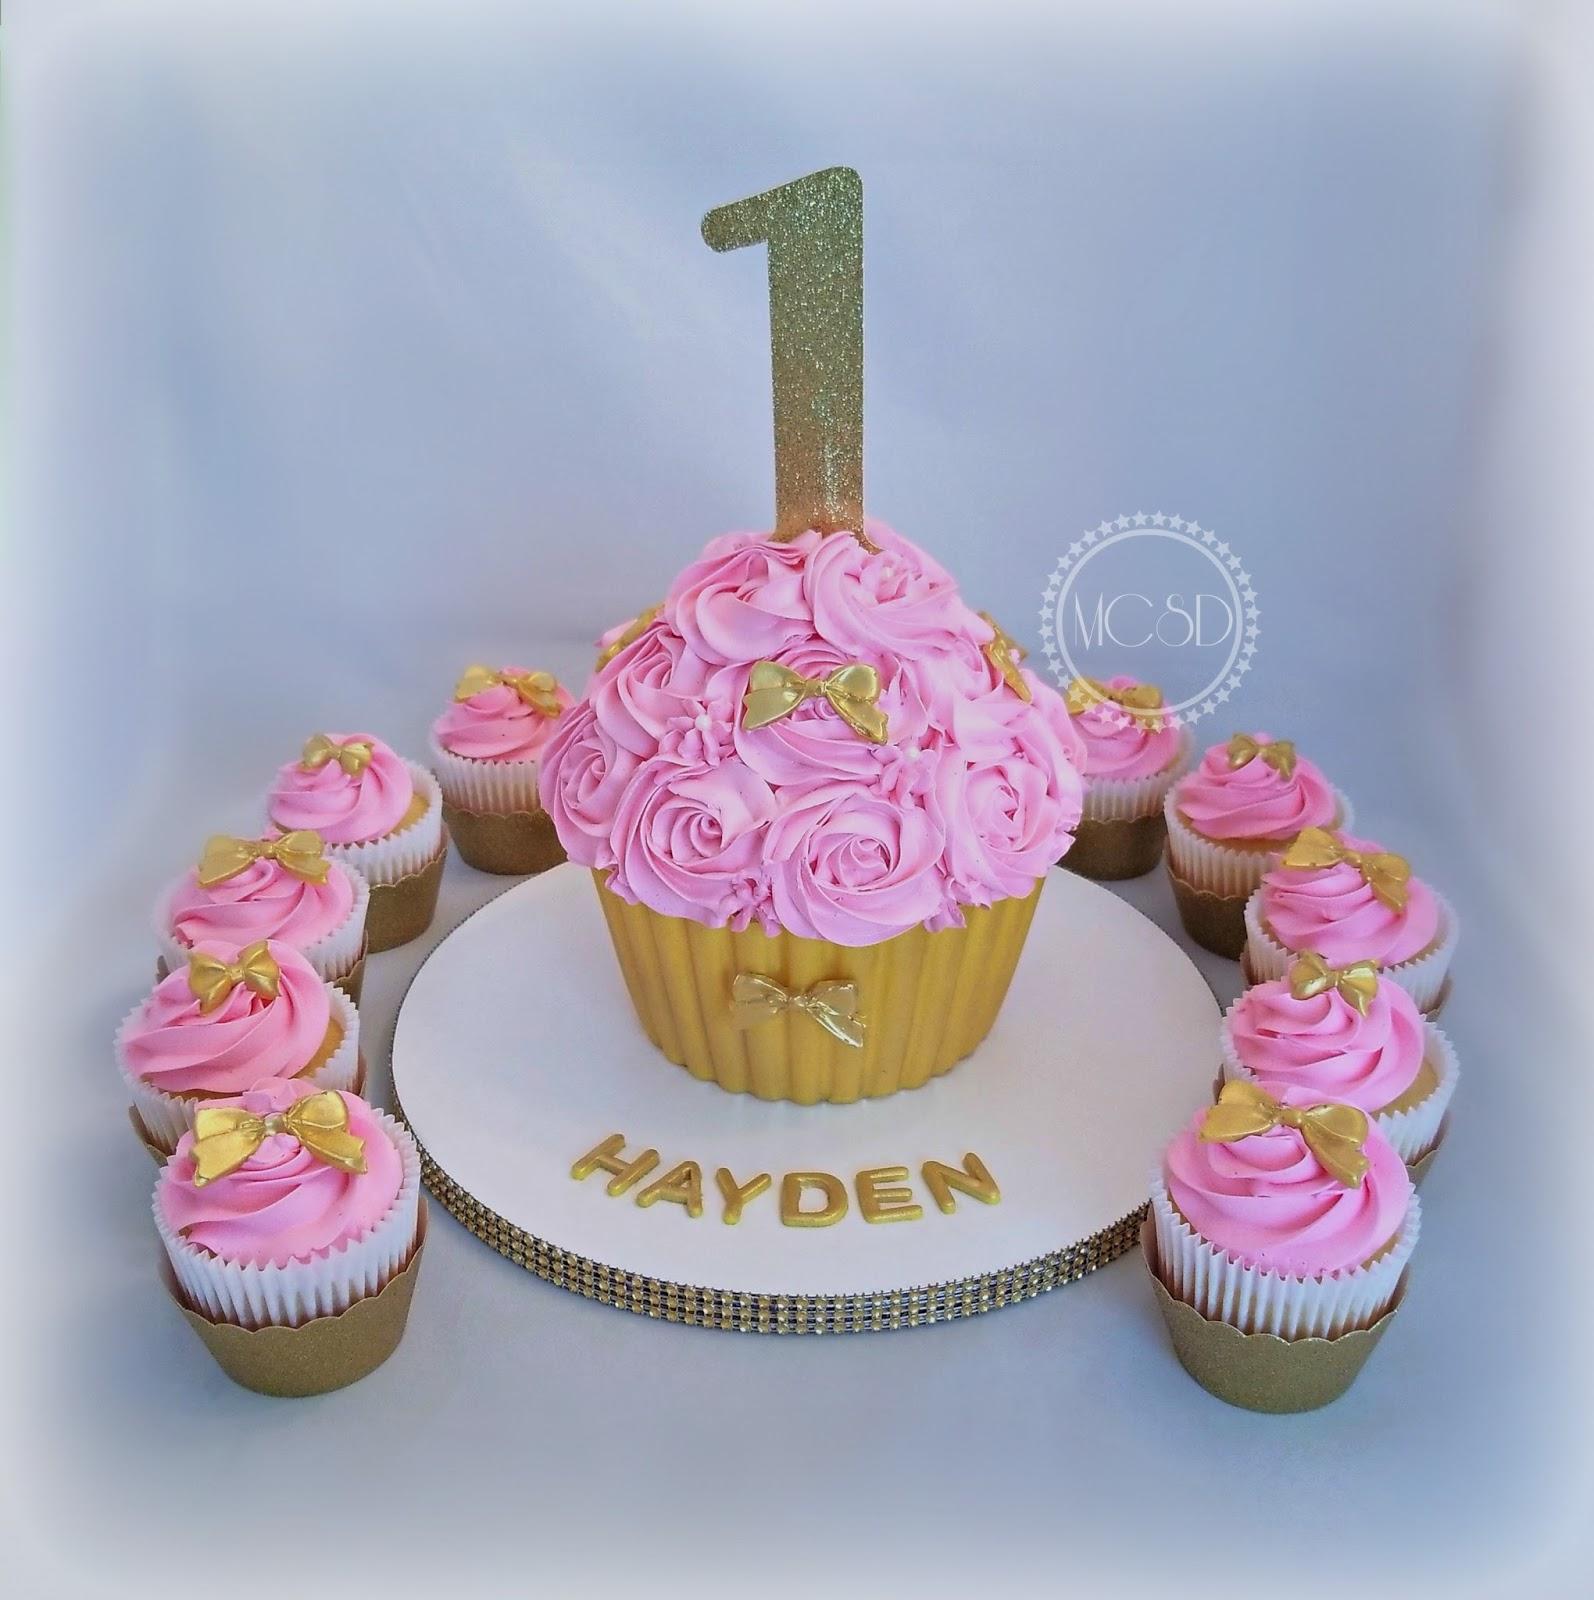 Pleasing Cakesbyzana 1St Birthday Cupcake Cake Cupcakes Funny Birthday Cards Online Bapapcheapnameinfo